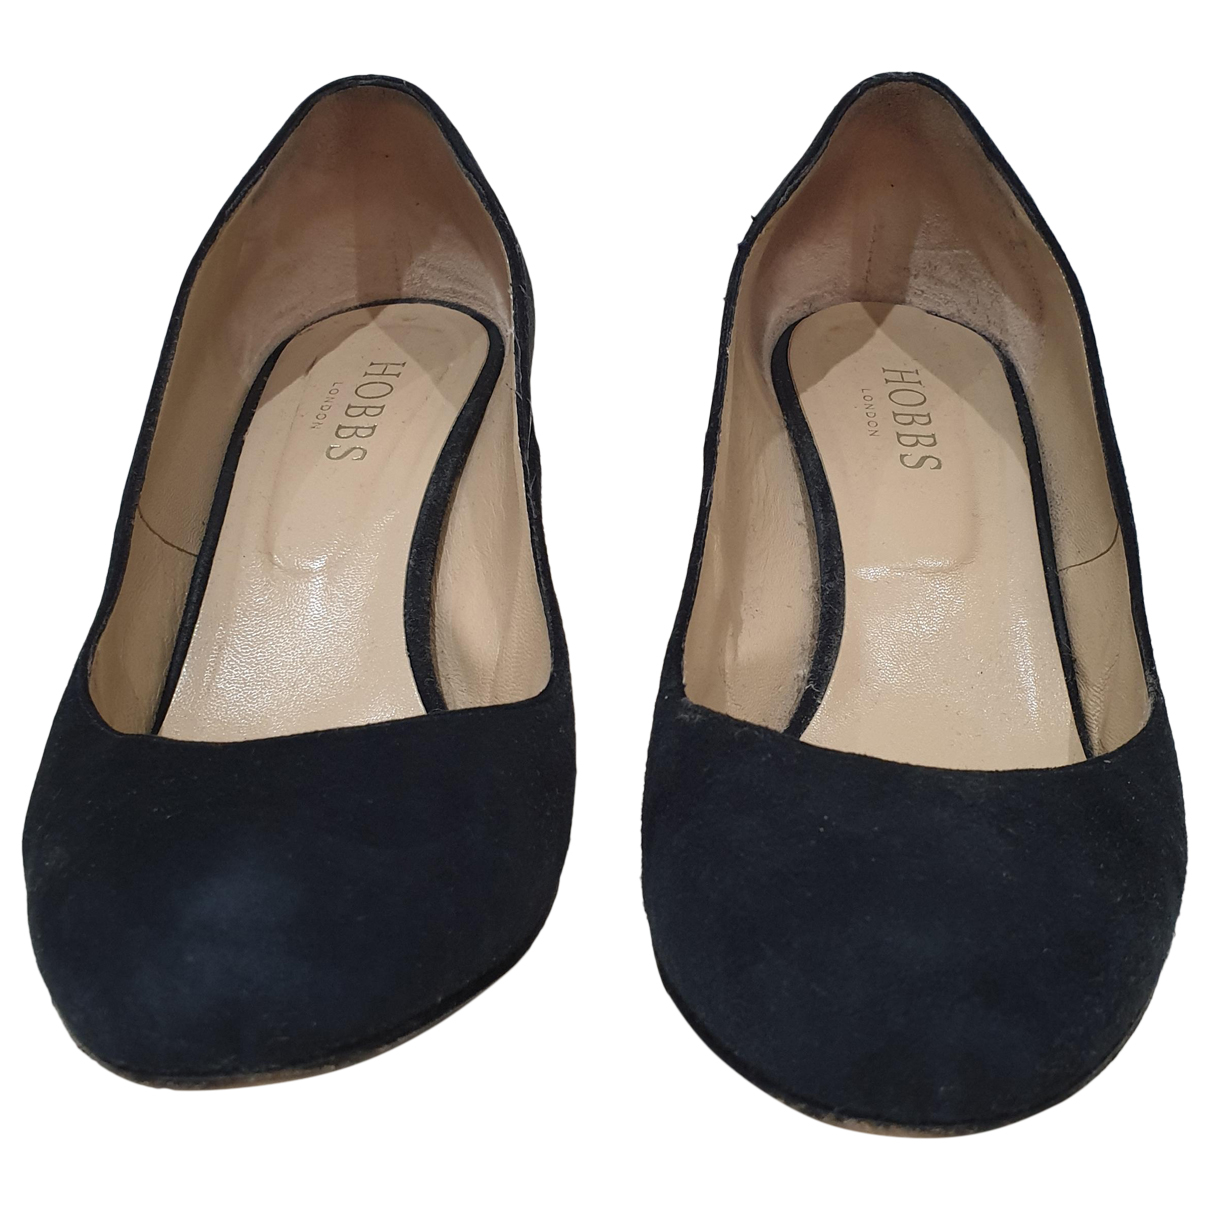 Hobbs N Blue Suede Heels for Women 38.5 EU